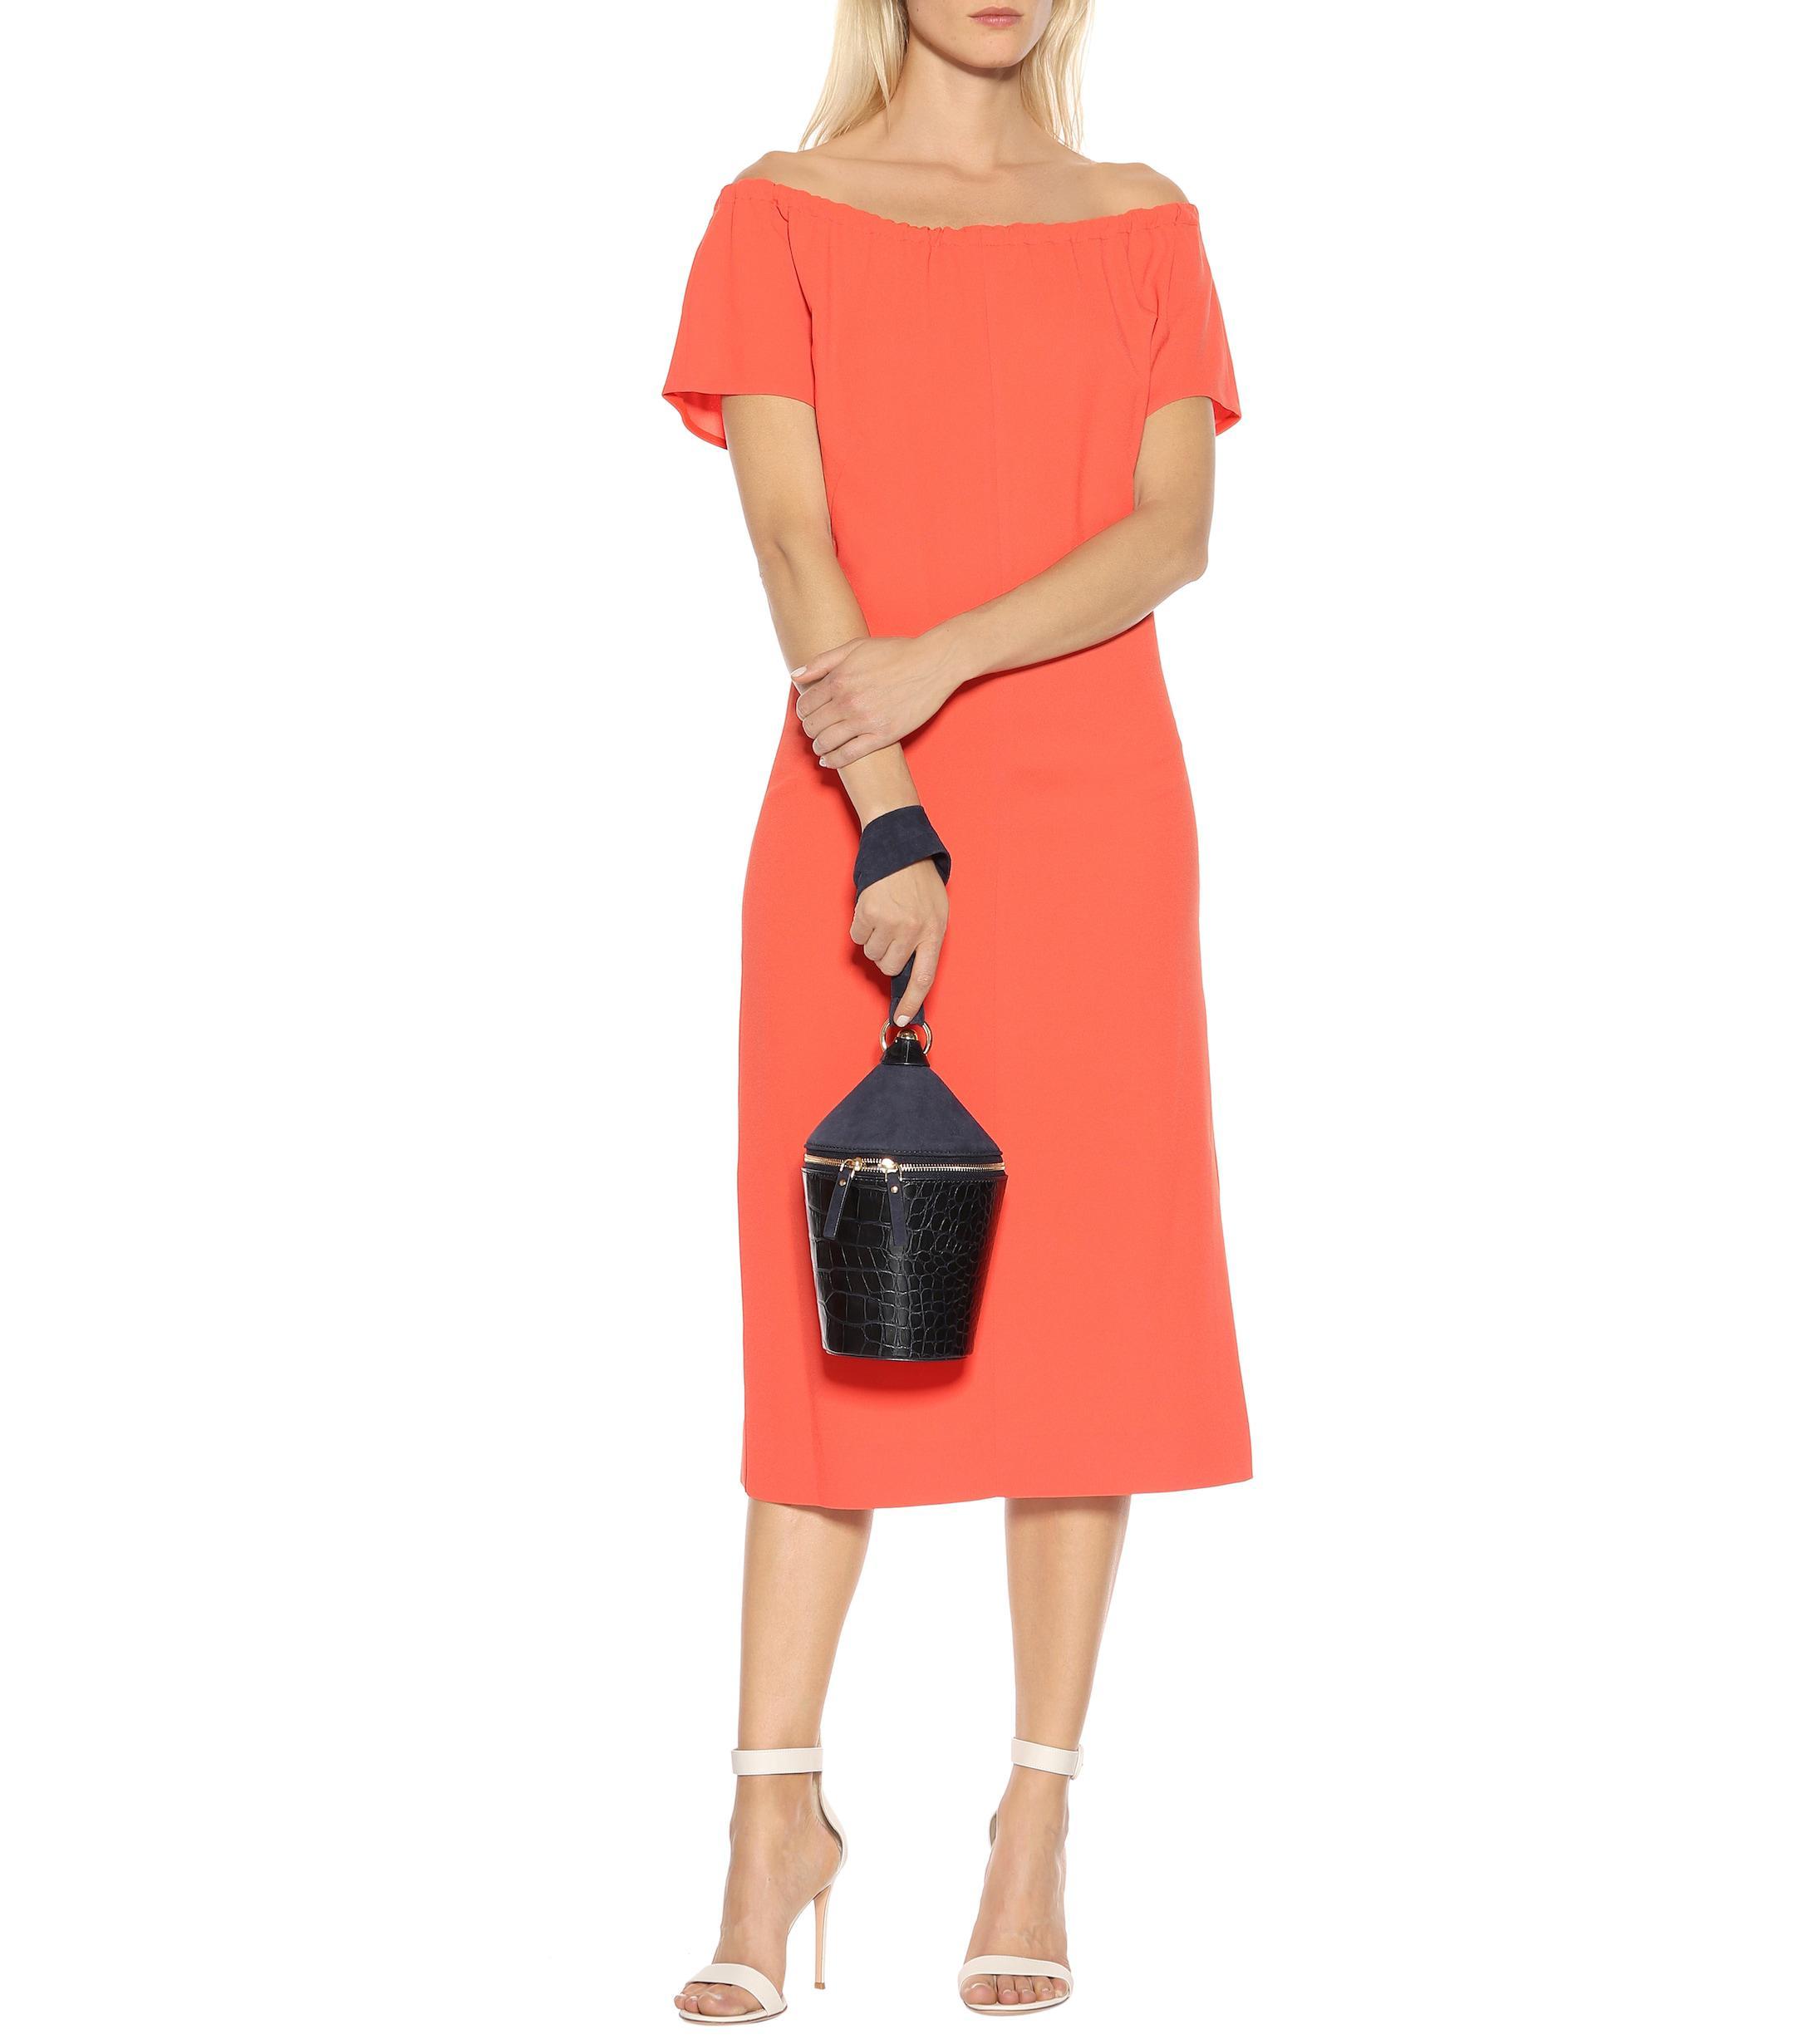 bdb1a00b5c Diane von Furstenberg - Multicolor Satin-crêpe Dress - Lyst. View fullscreen